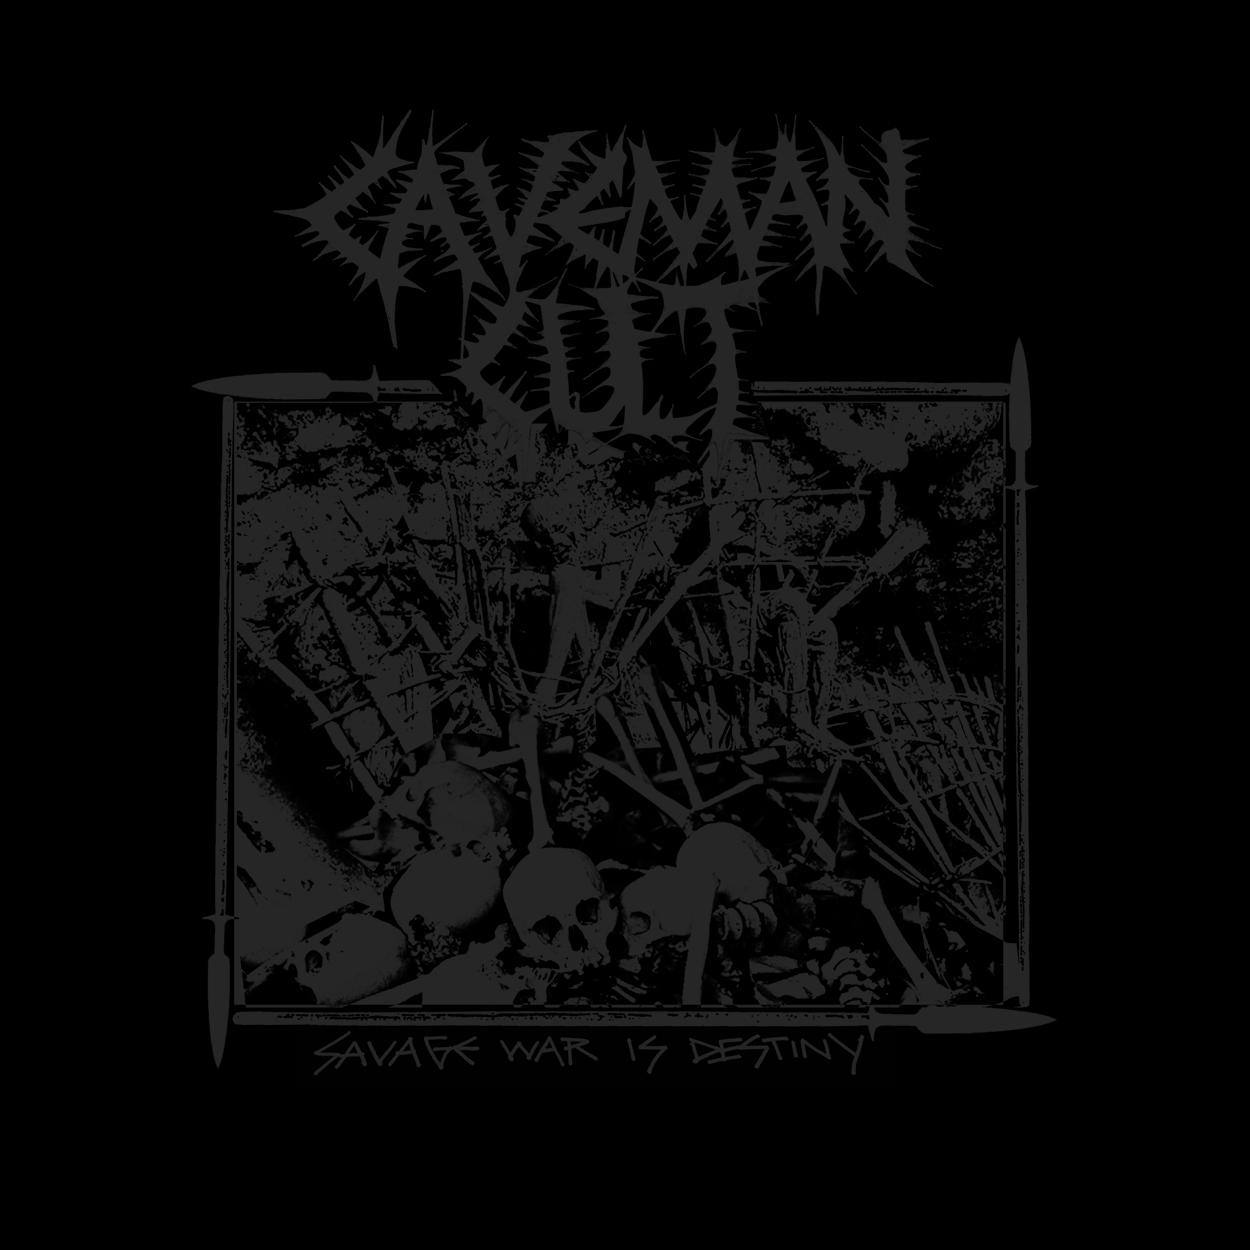 "CAVEMAN CULT ""Savage War Is Destiny"" CD 9.99"